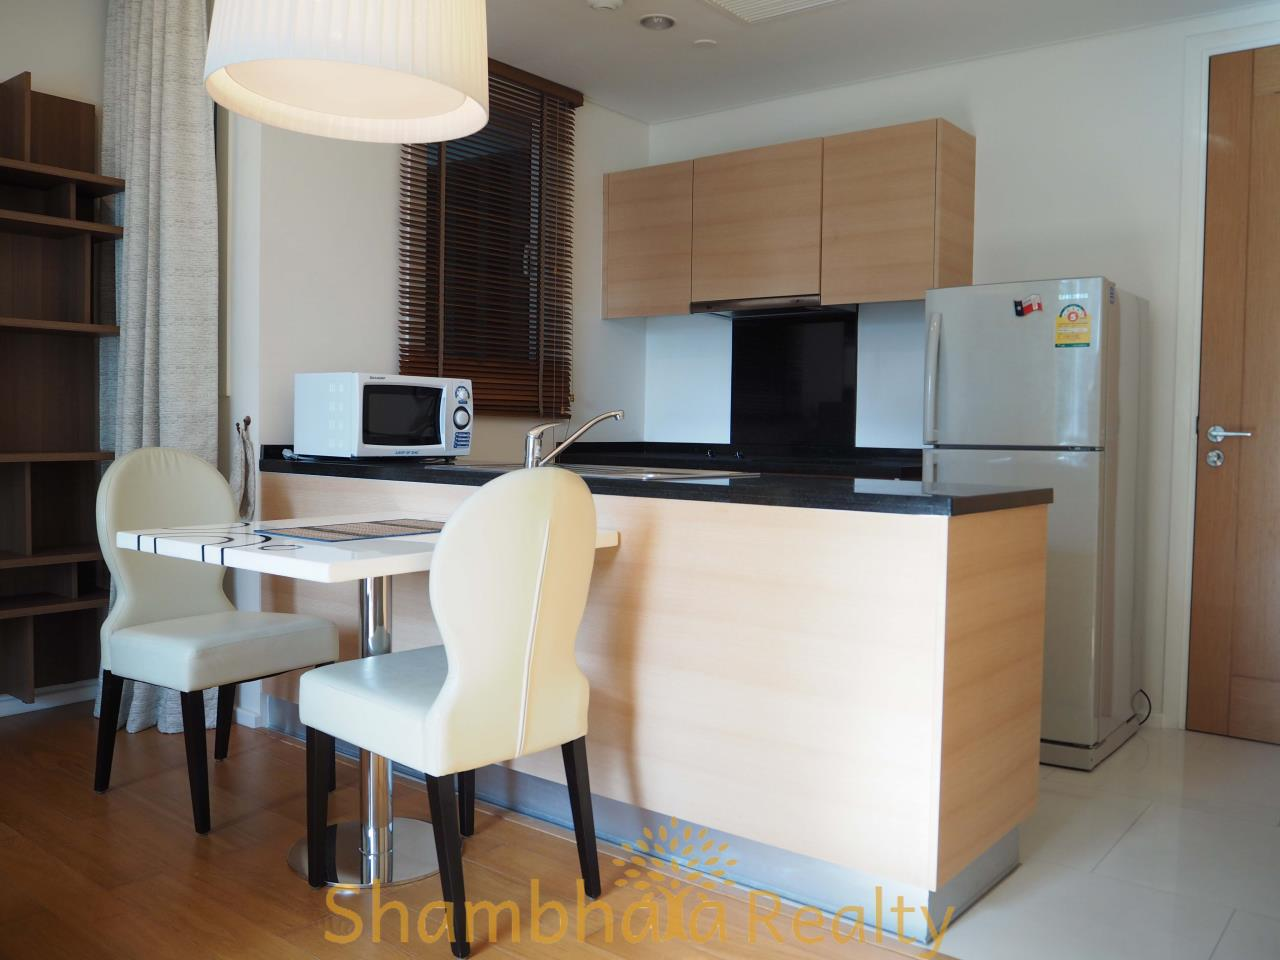 Shambhala Realty Agency's Wind Sukhumvit 23 Condominium for Rent in Sukhumvit 23 21